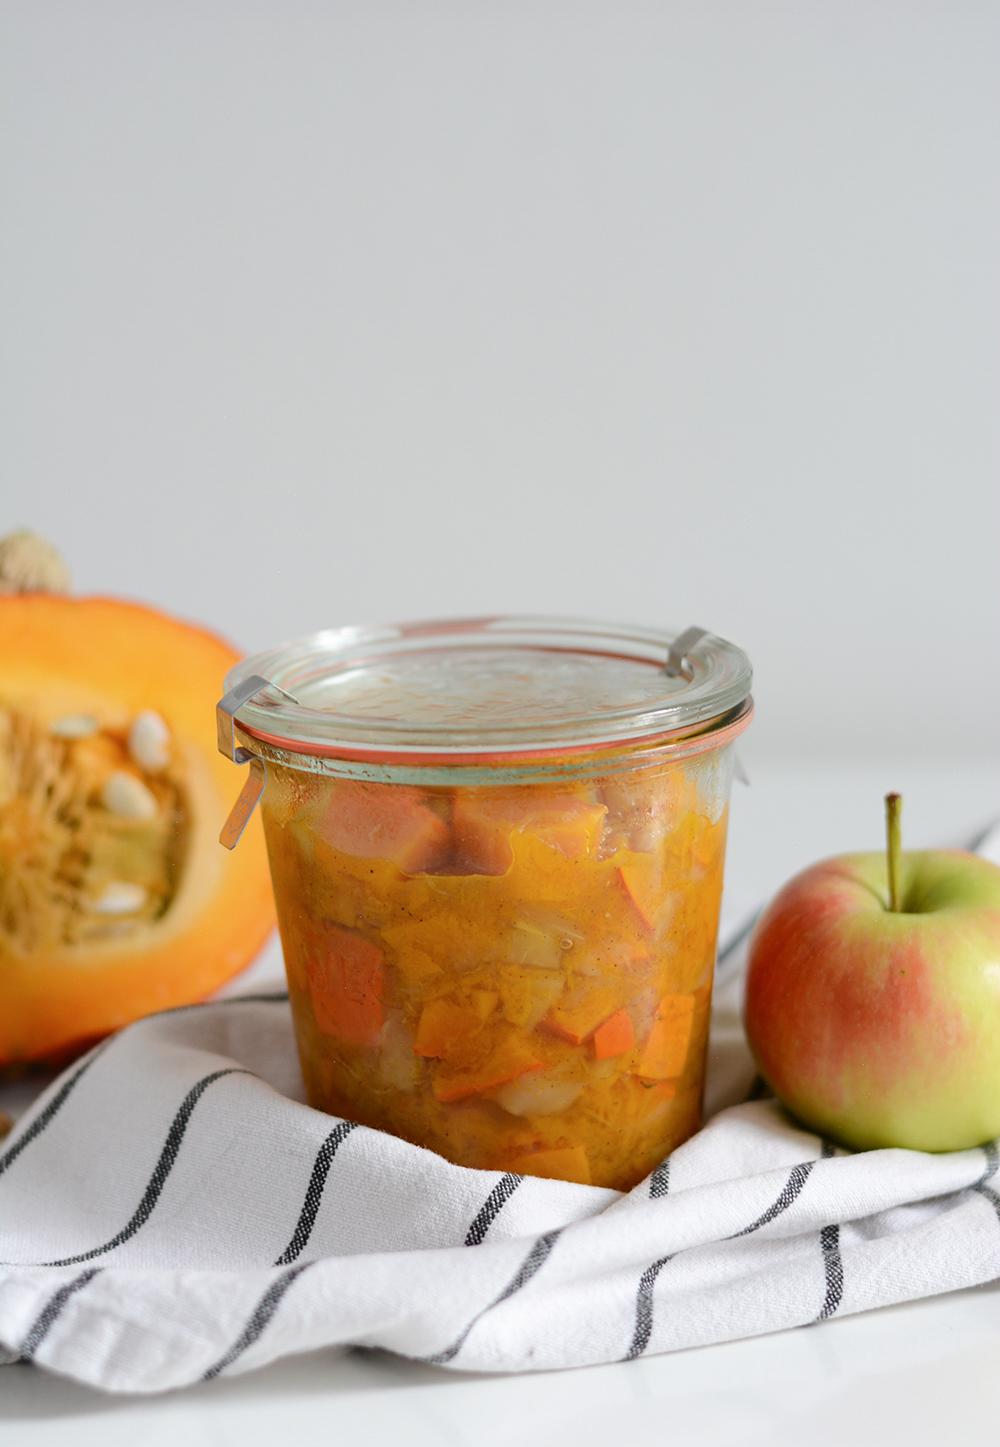 Kürbis-Apfel-Chutney |we love handmade